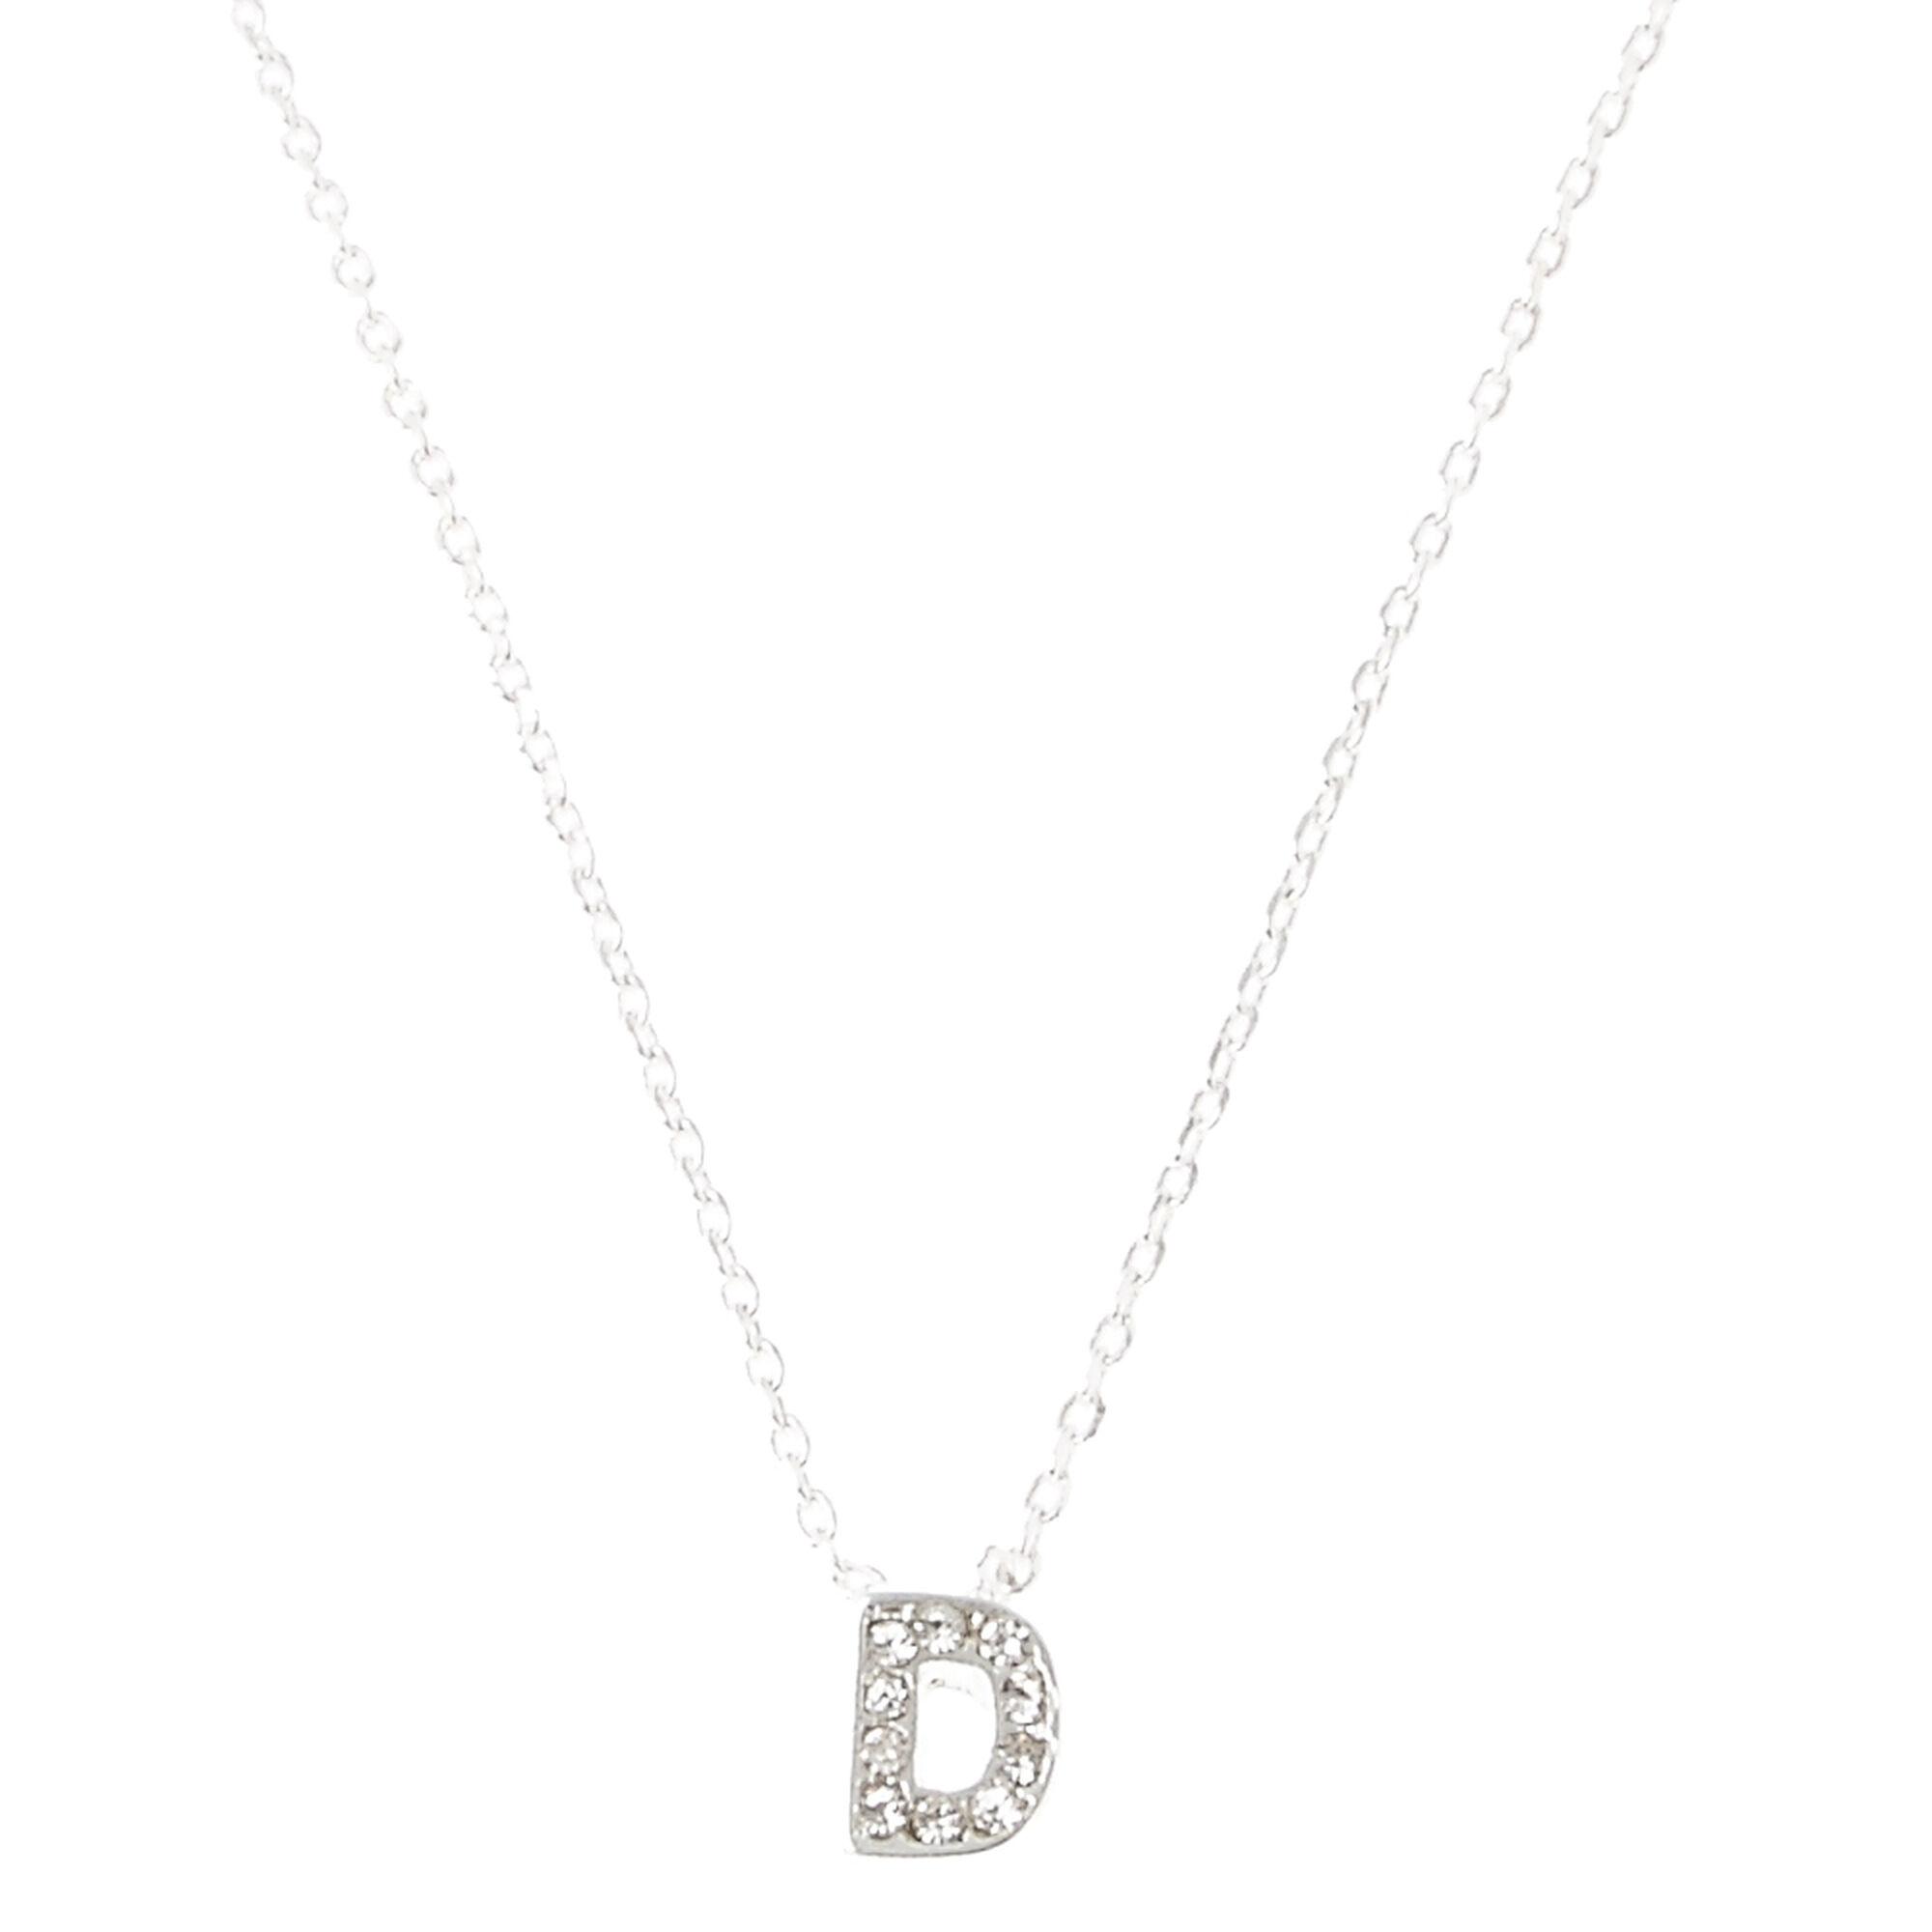 D pendant initial necklace icing us quotdquot pendant aloadofball Choice Image